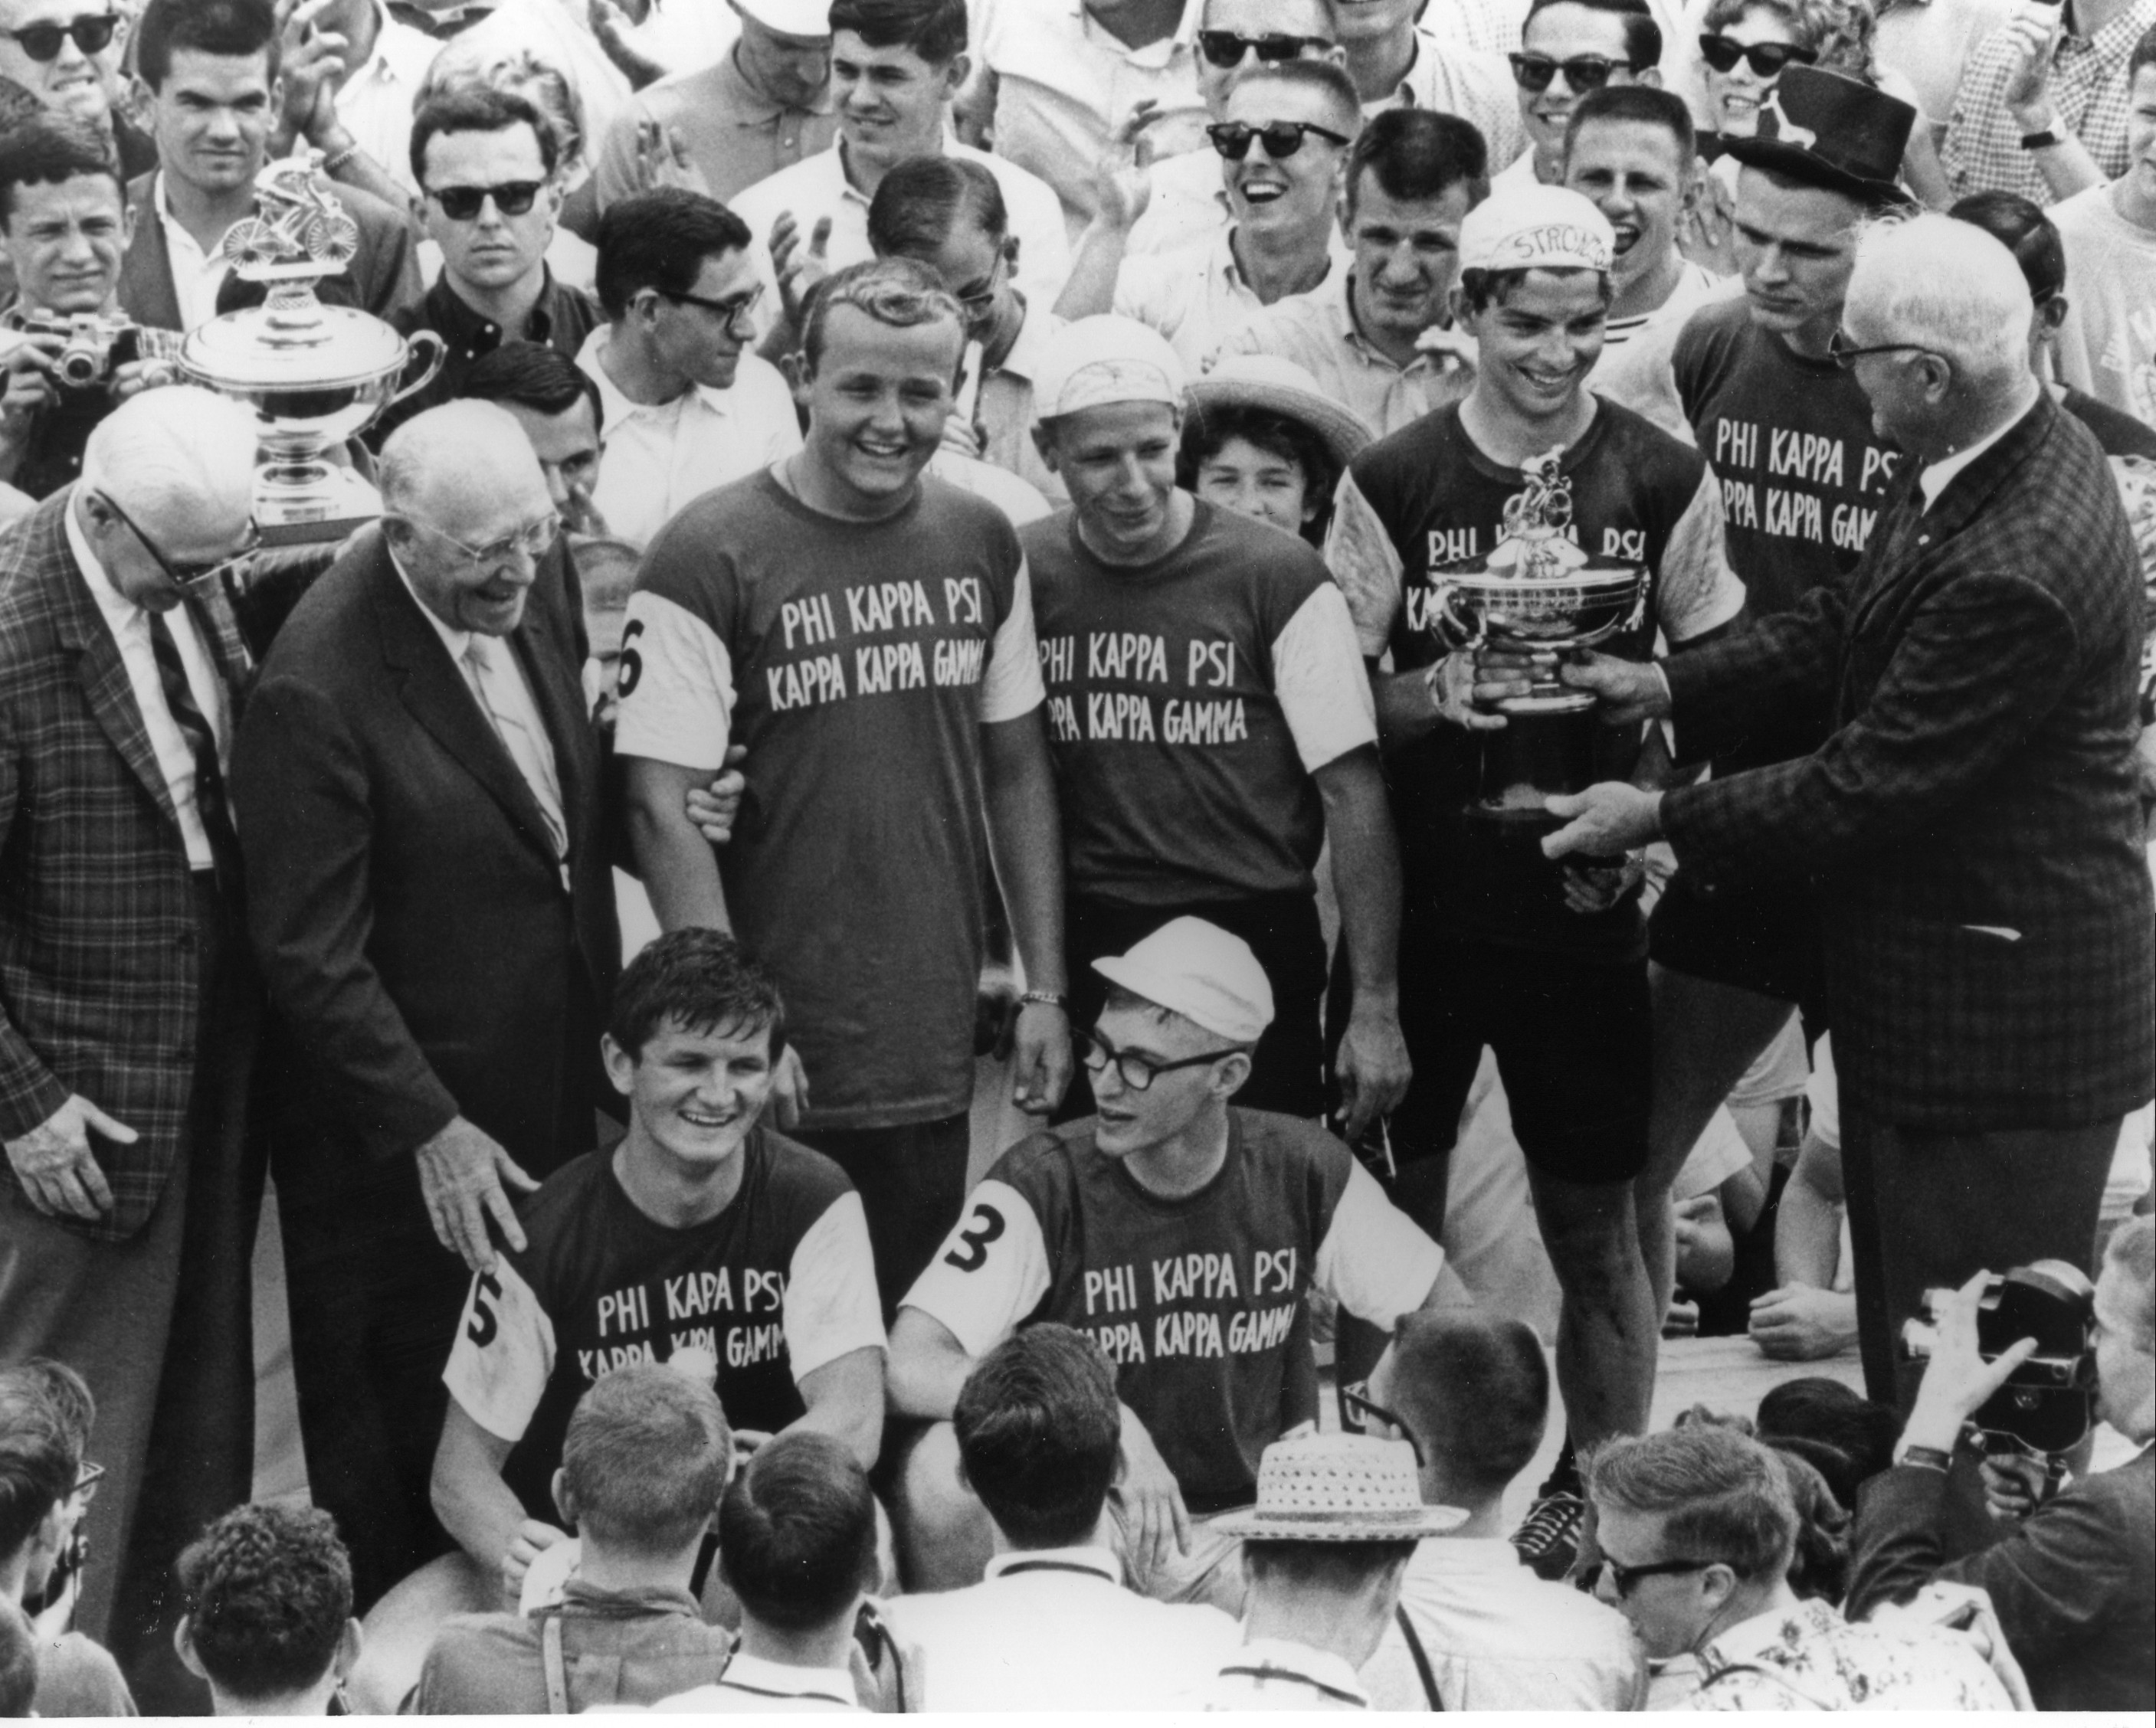 1962 Phi Kappa Psi Winners